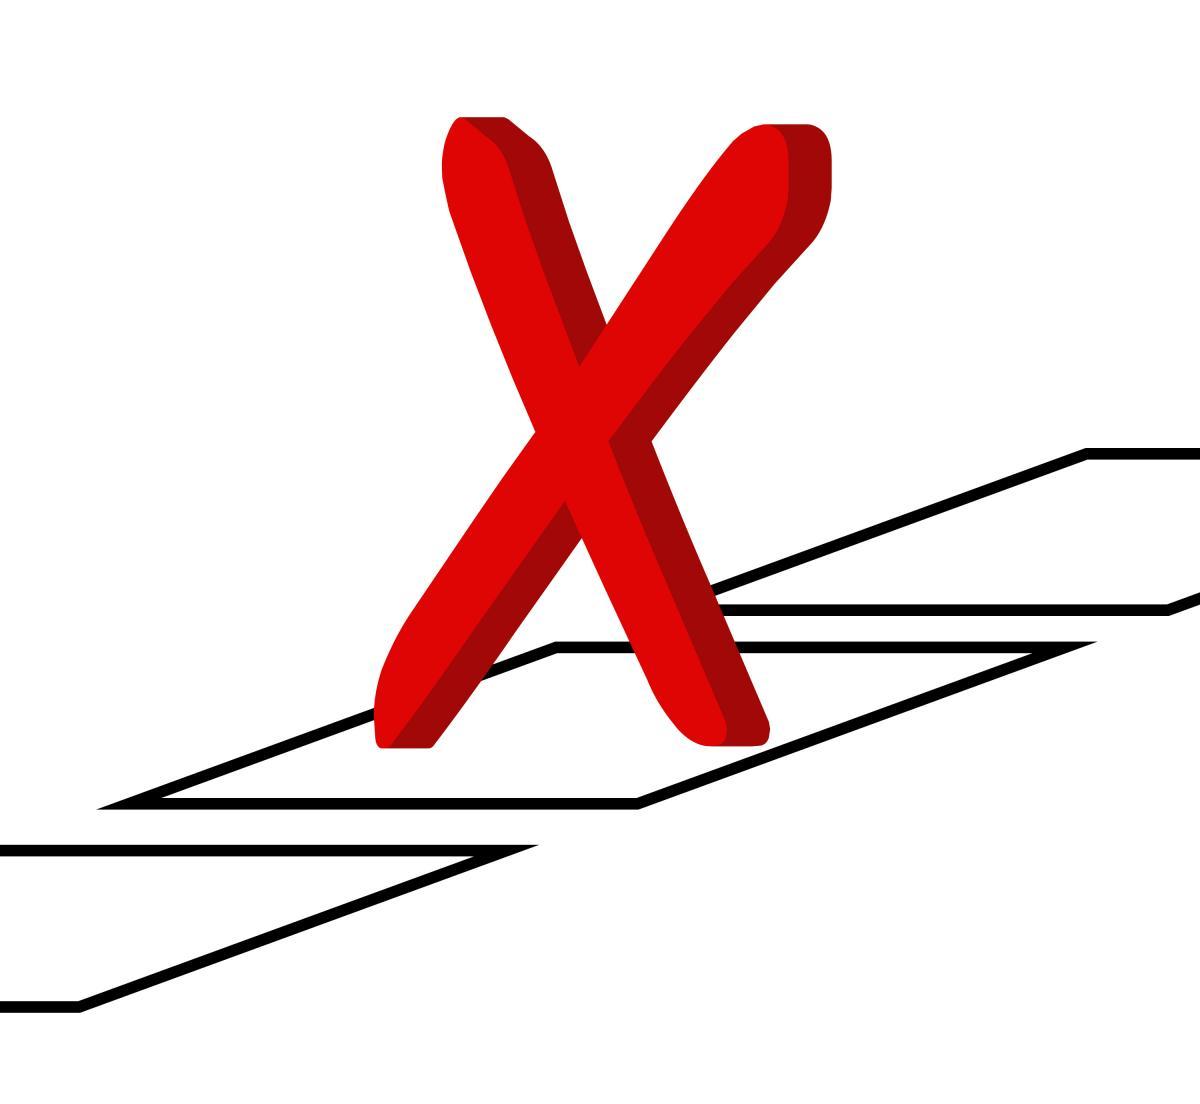 X the ballot